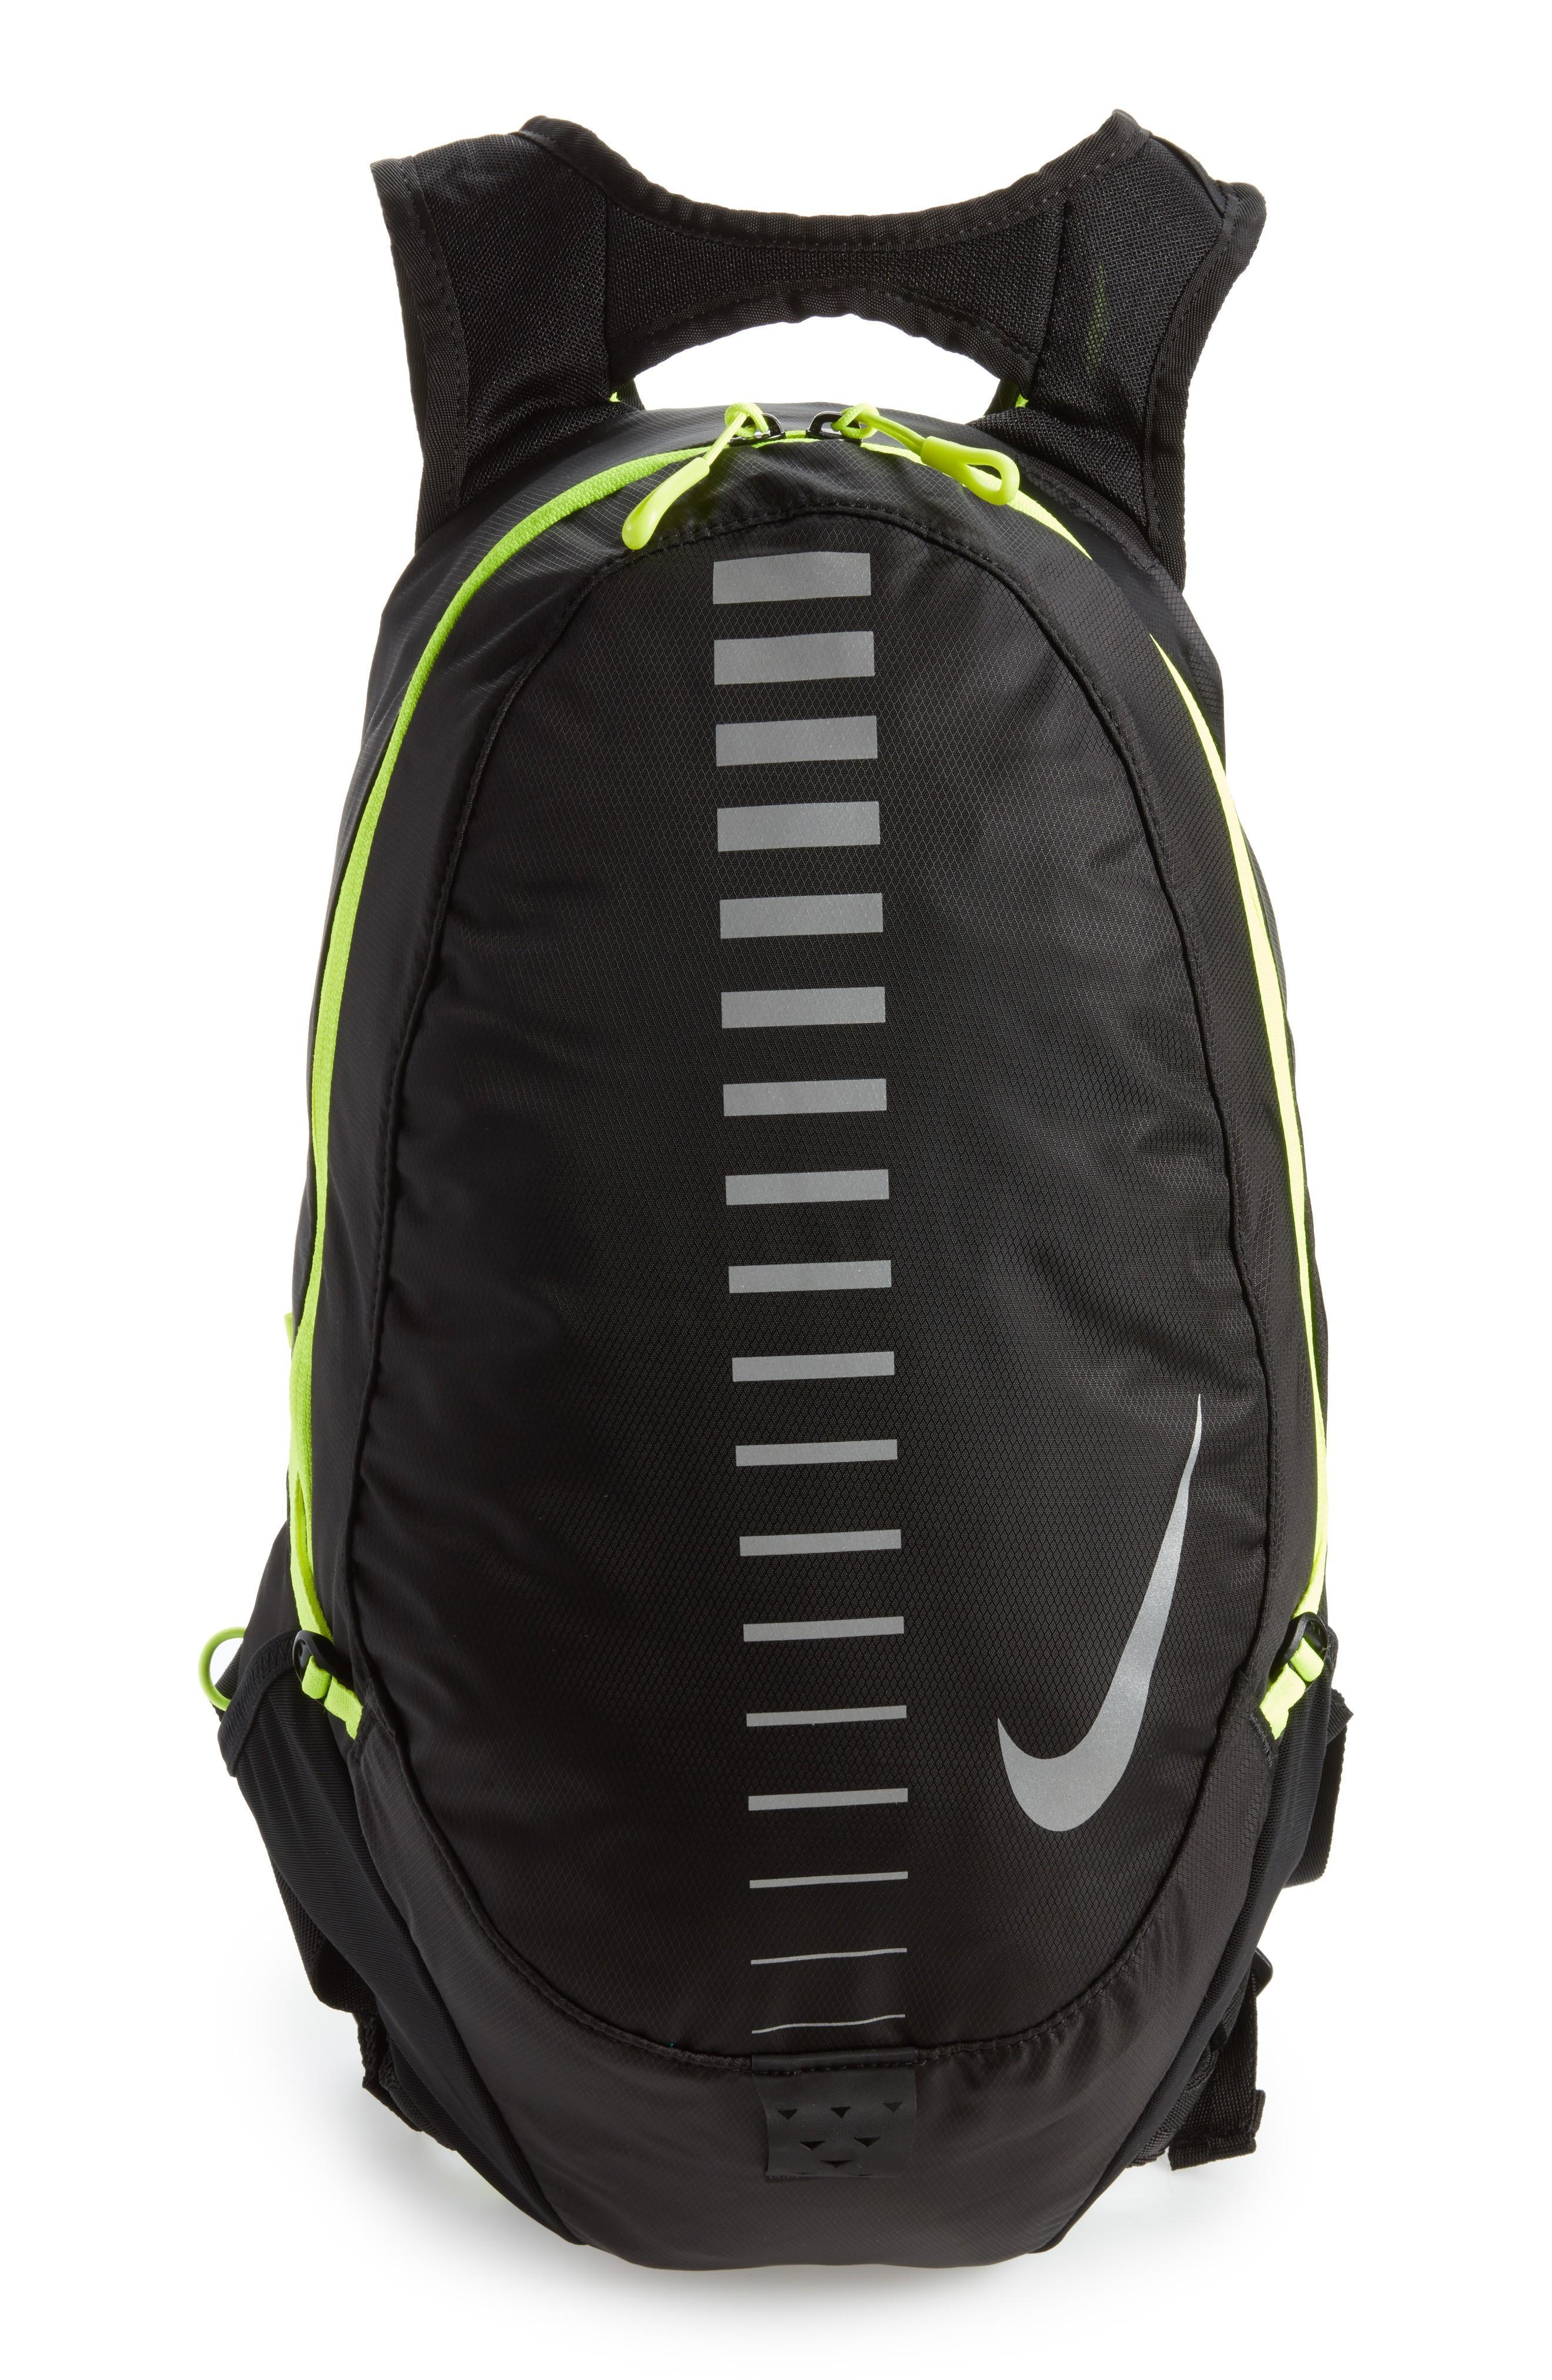 52098b37455 Nike Run Commuter Backpack - Black In Black/ Volt/ Silver | ModeSens